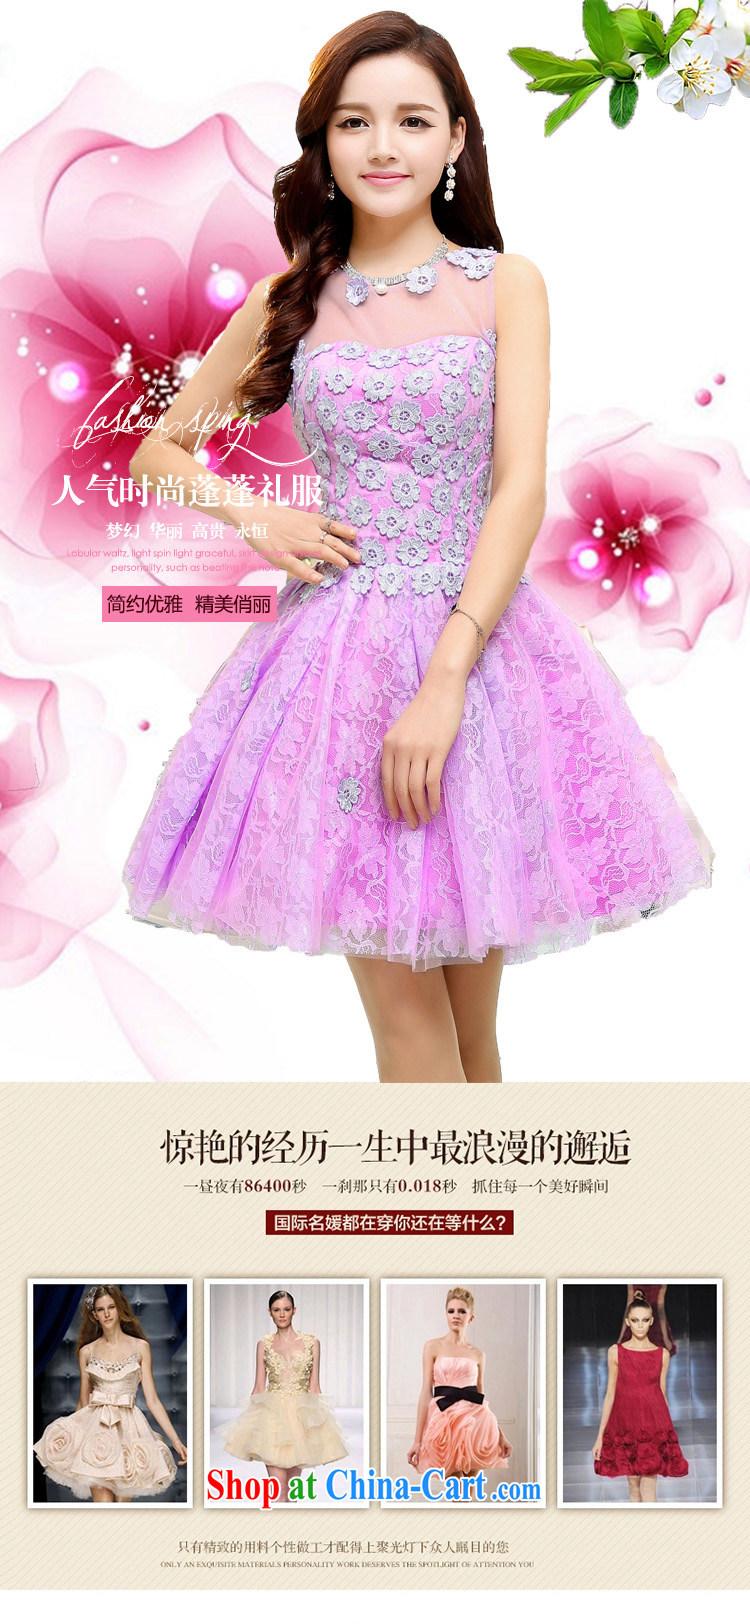 wedding dress skirt names name brand wedding dresses New Korean Beauty Fashion Round Collar Sleeveless Gy Dress Skirt 4 Season Long Wedding